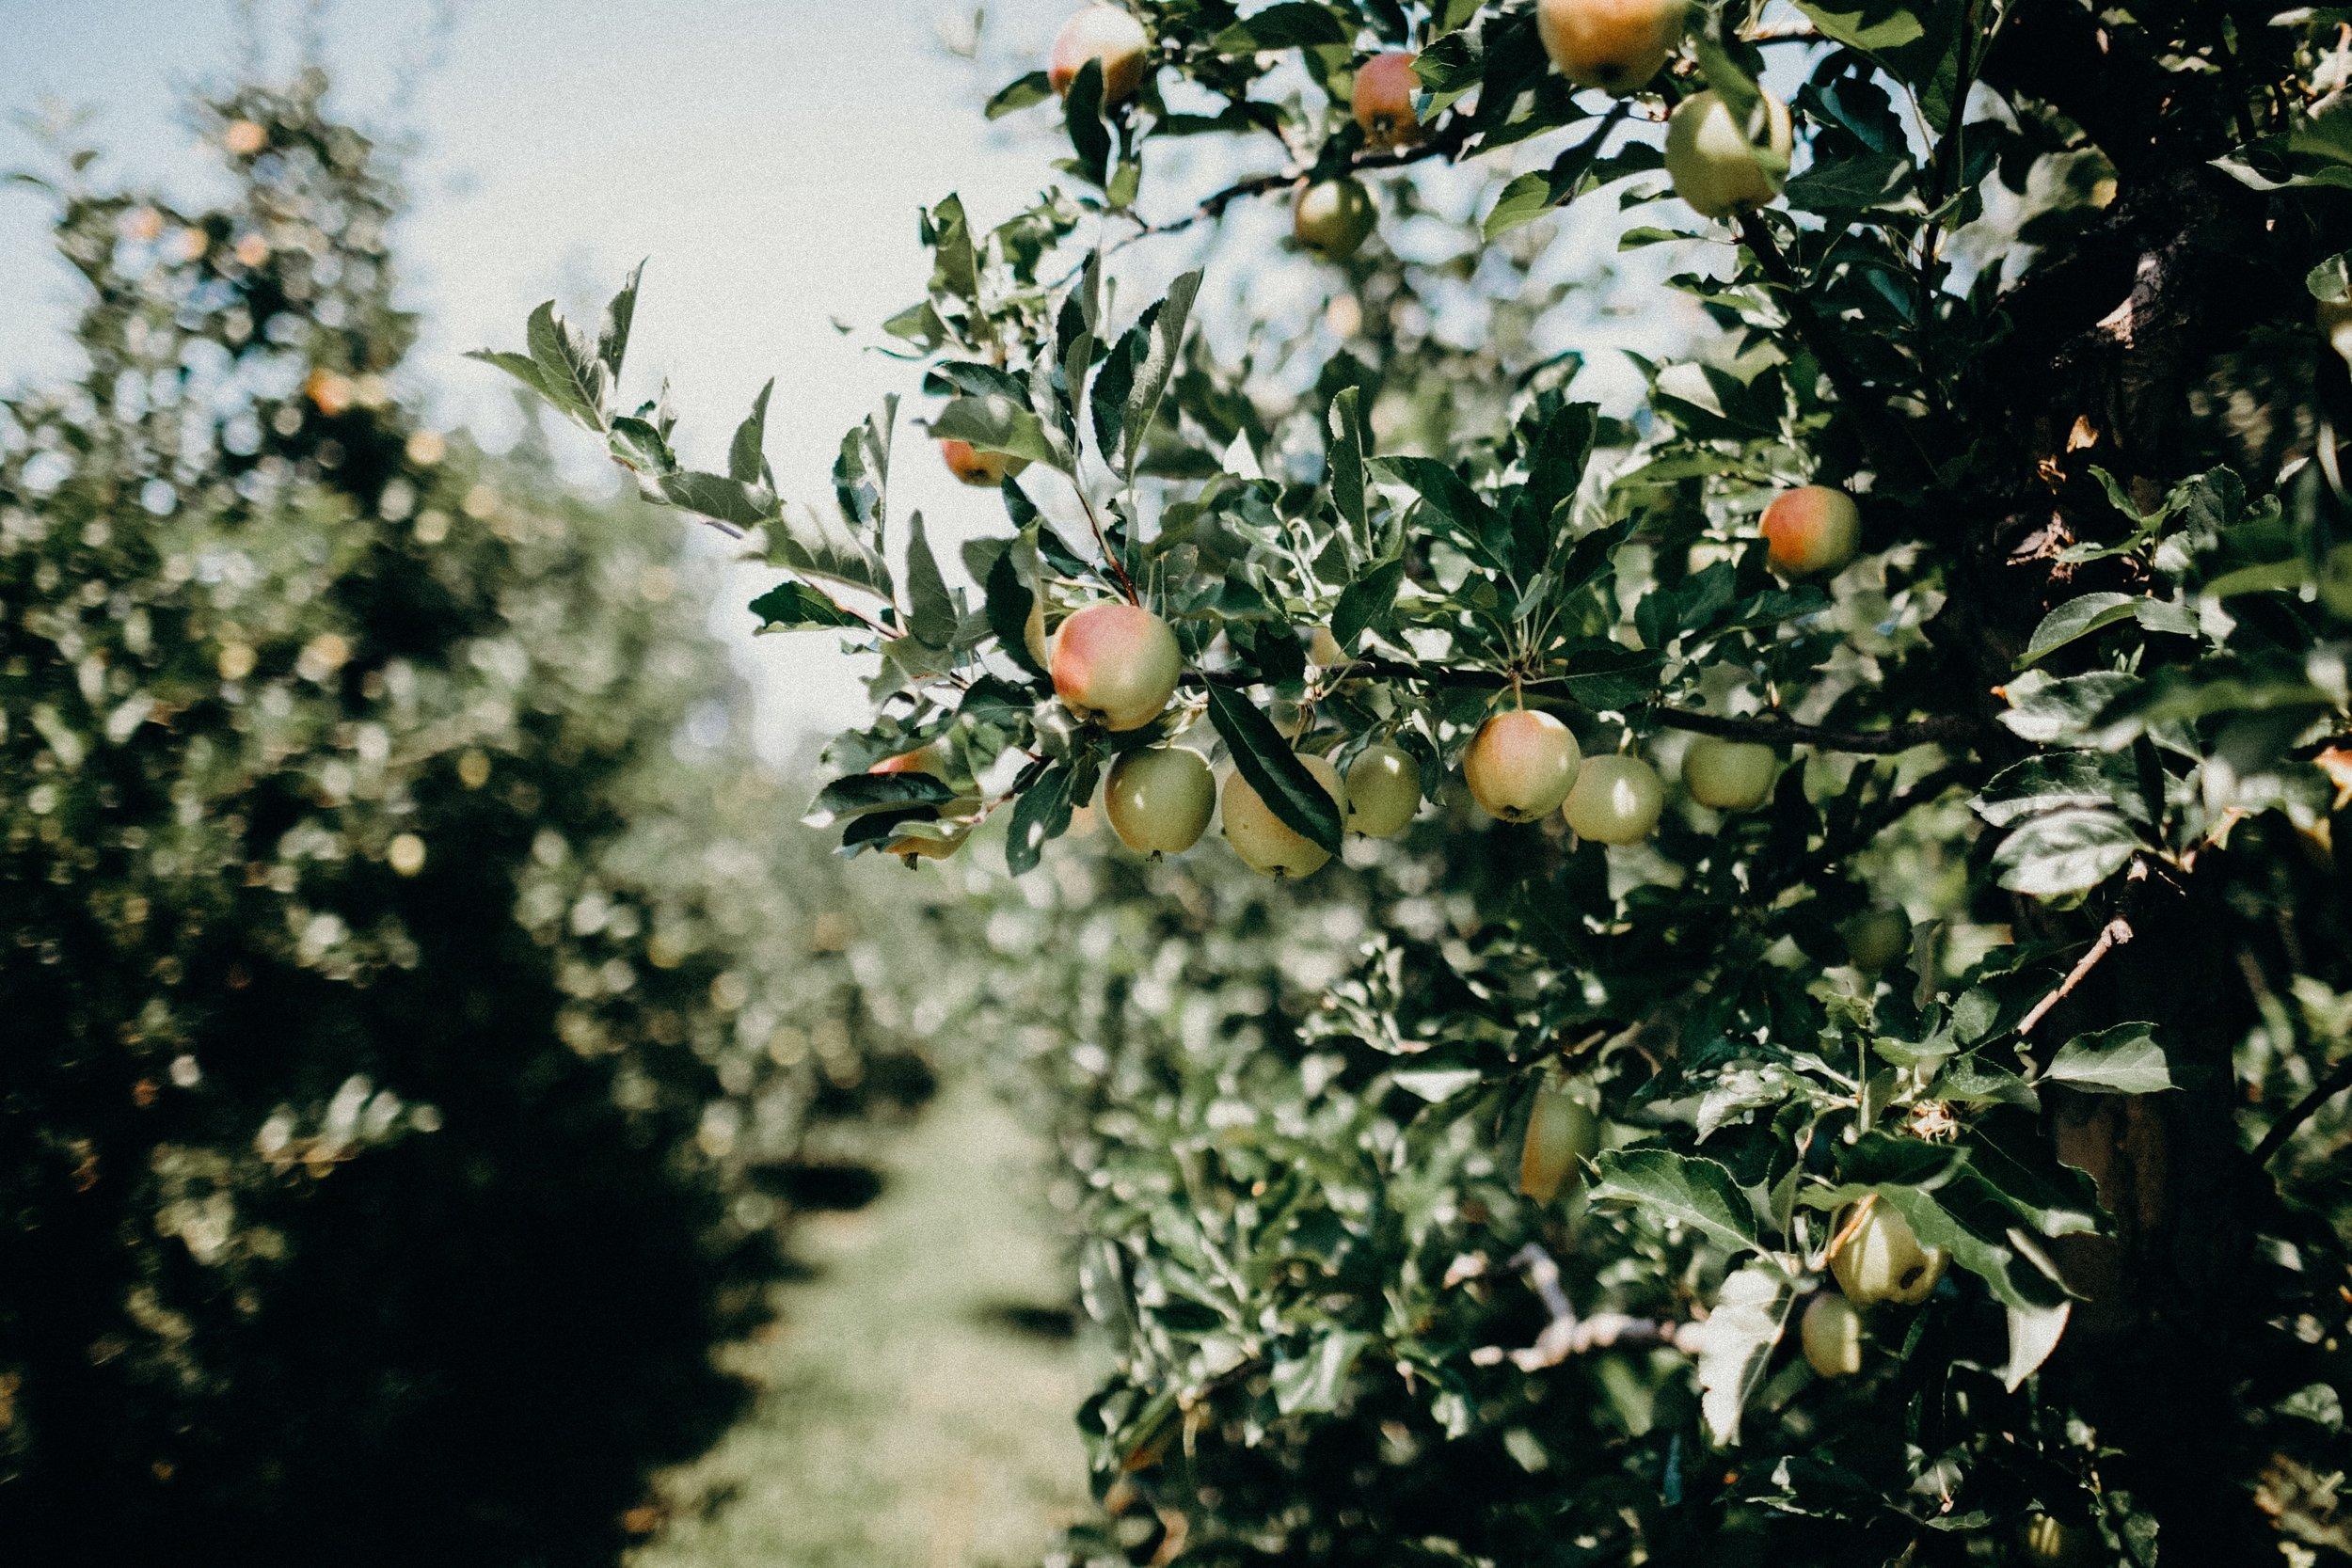 minneapolis-fall-orchard-family-mini-sessions-mn.jpg